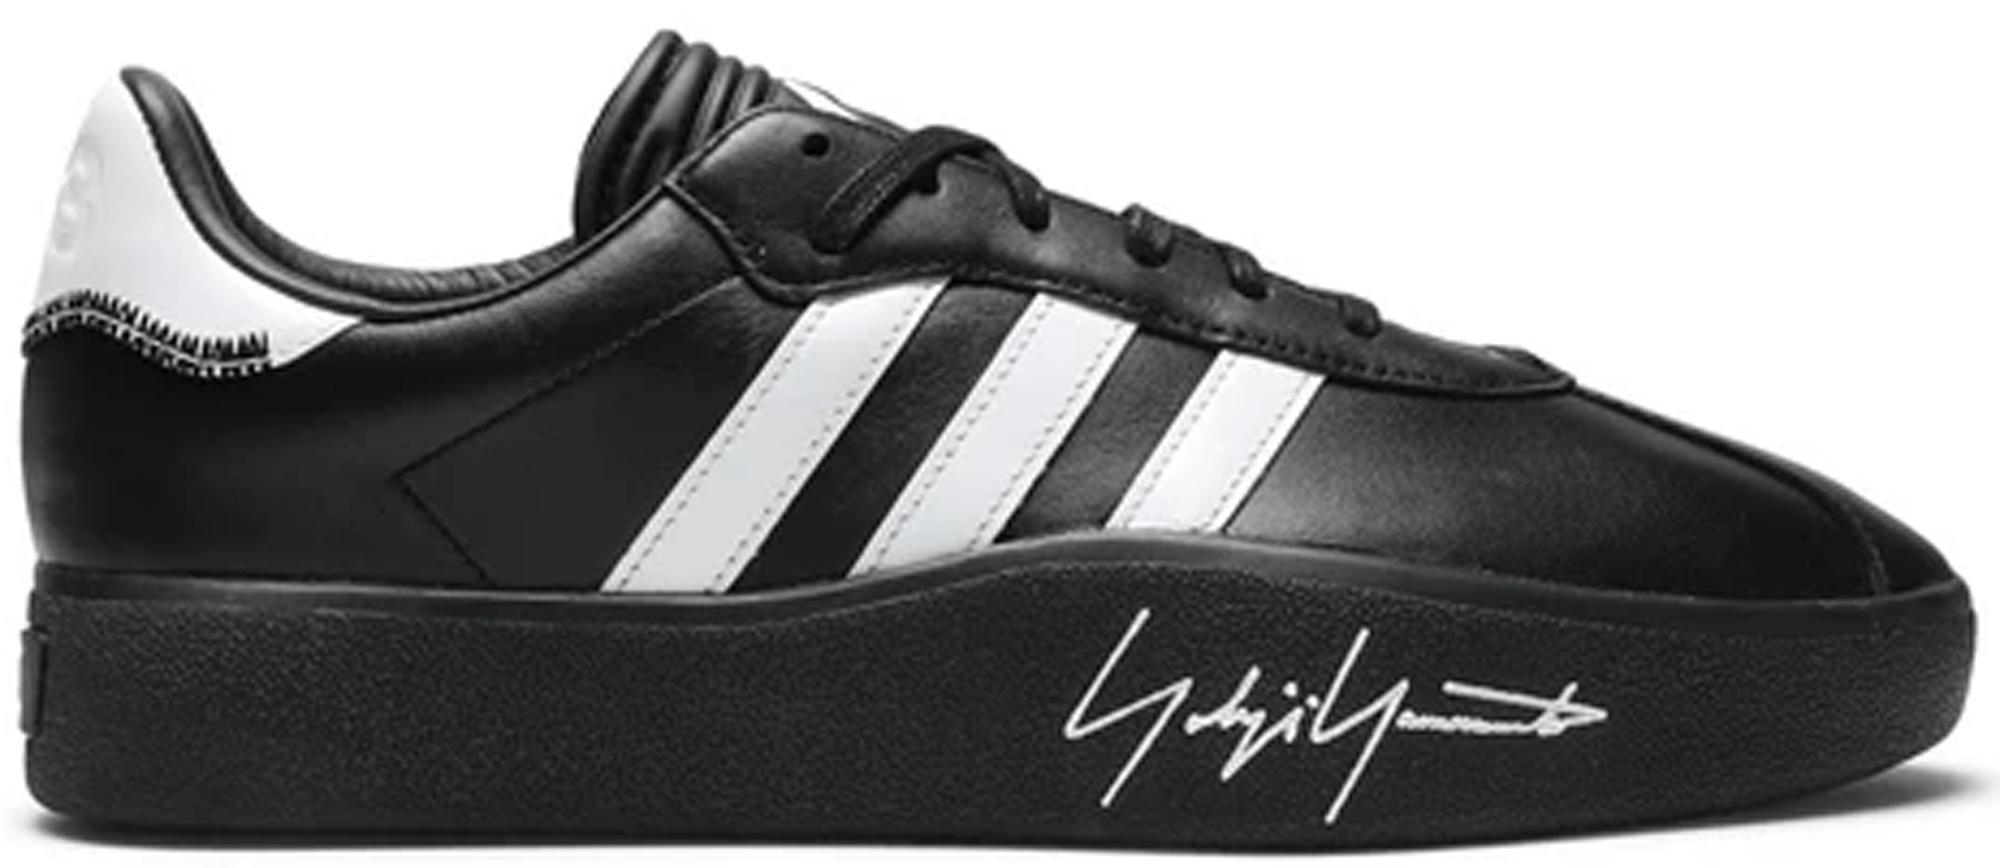 adidas Y-3 Tangutsu Football Black